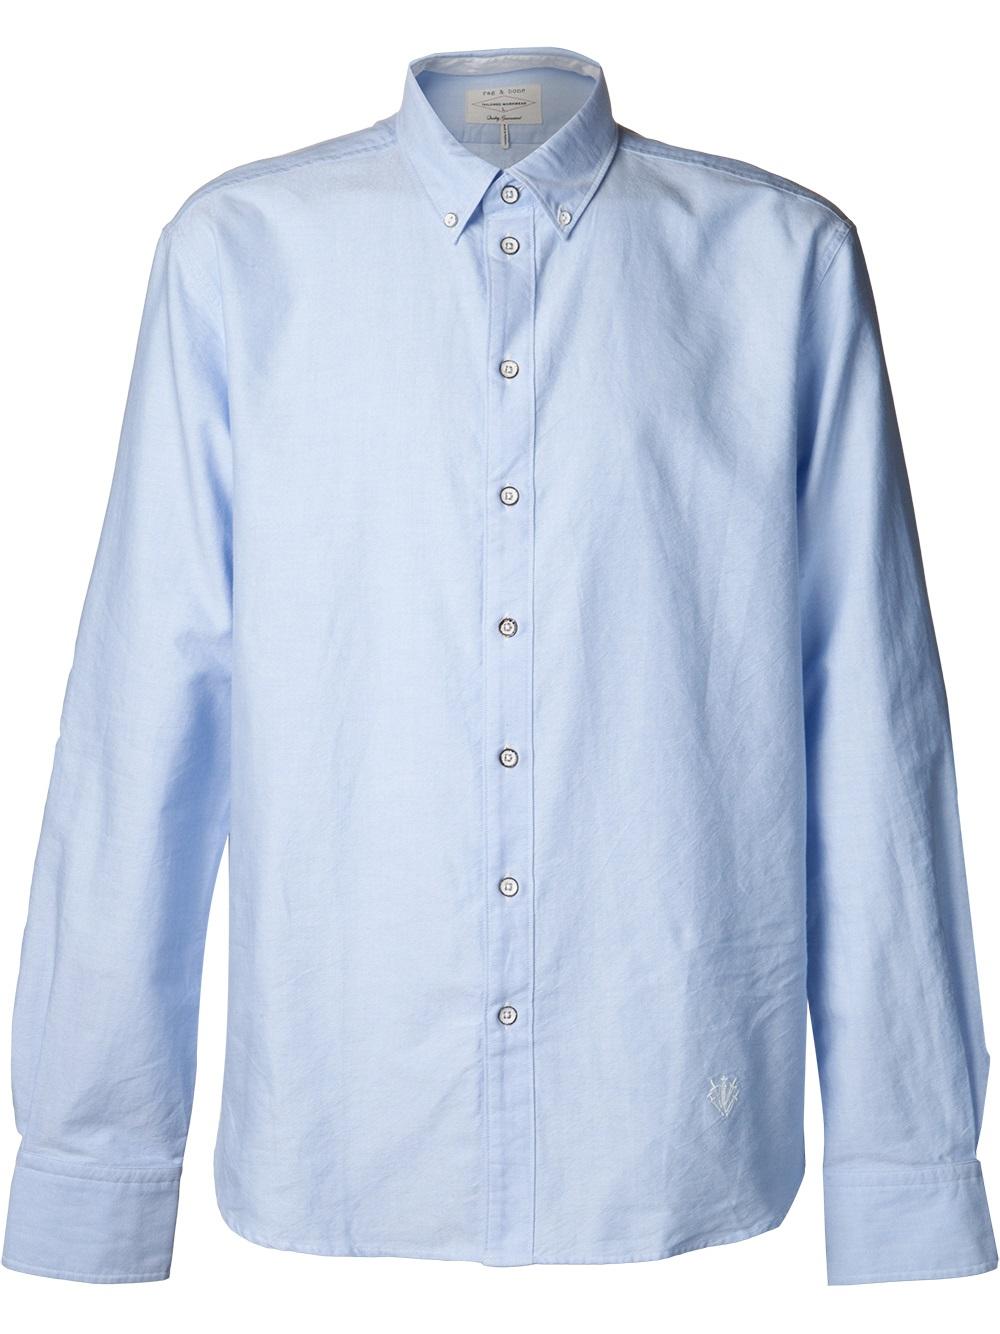 Rag Amp Bone Button Down Oxford Shirt In Blue For Men Lyst